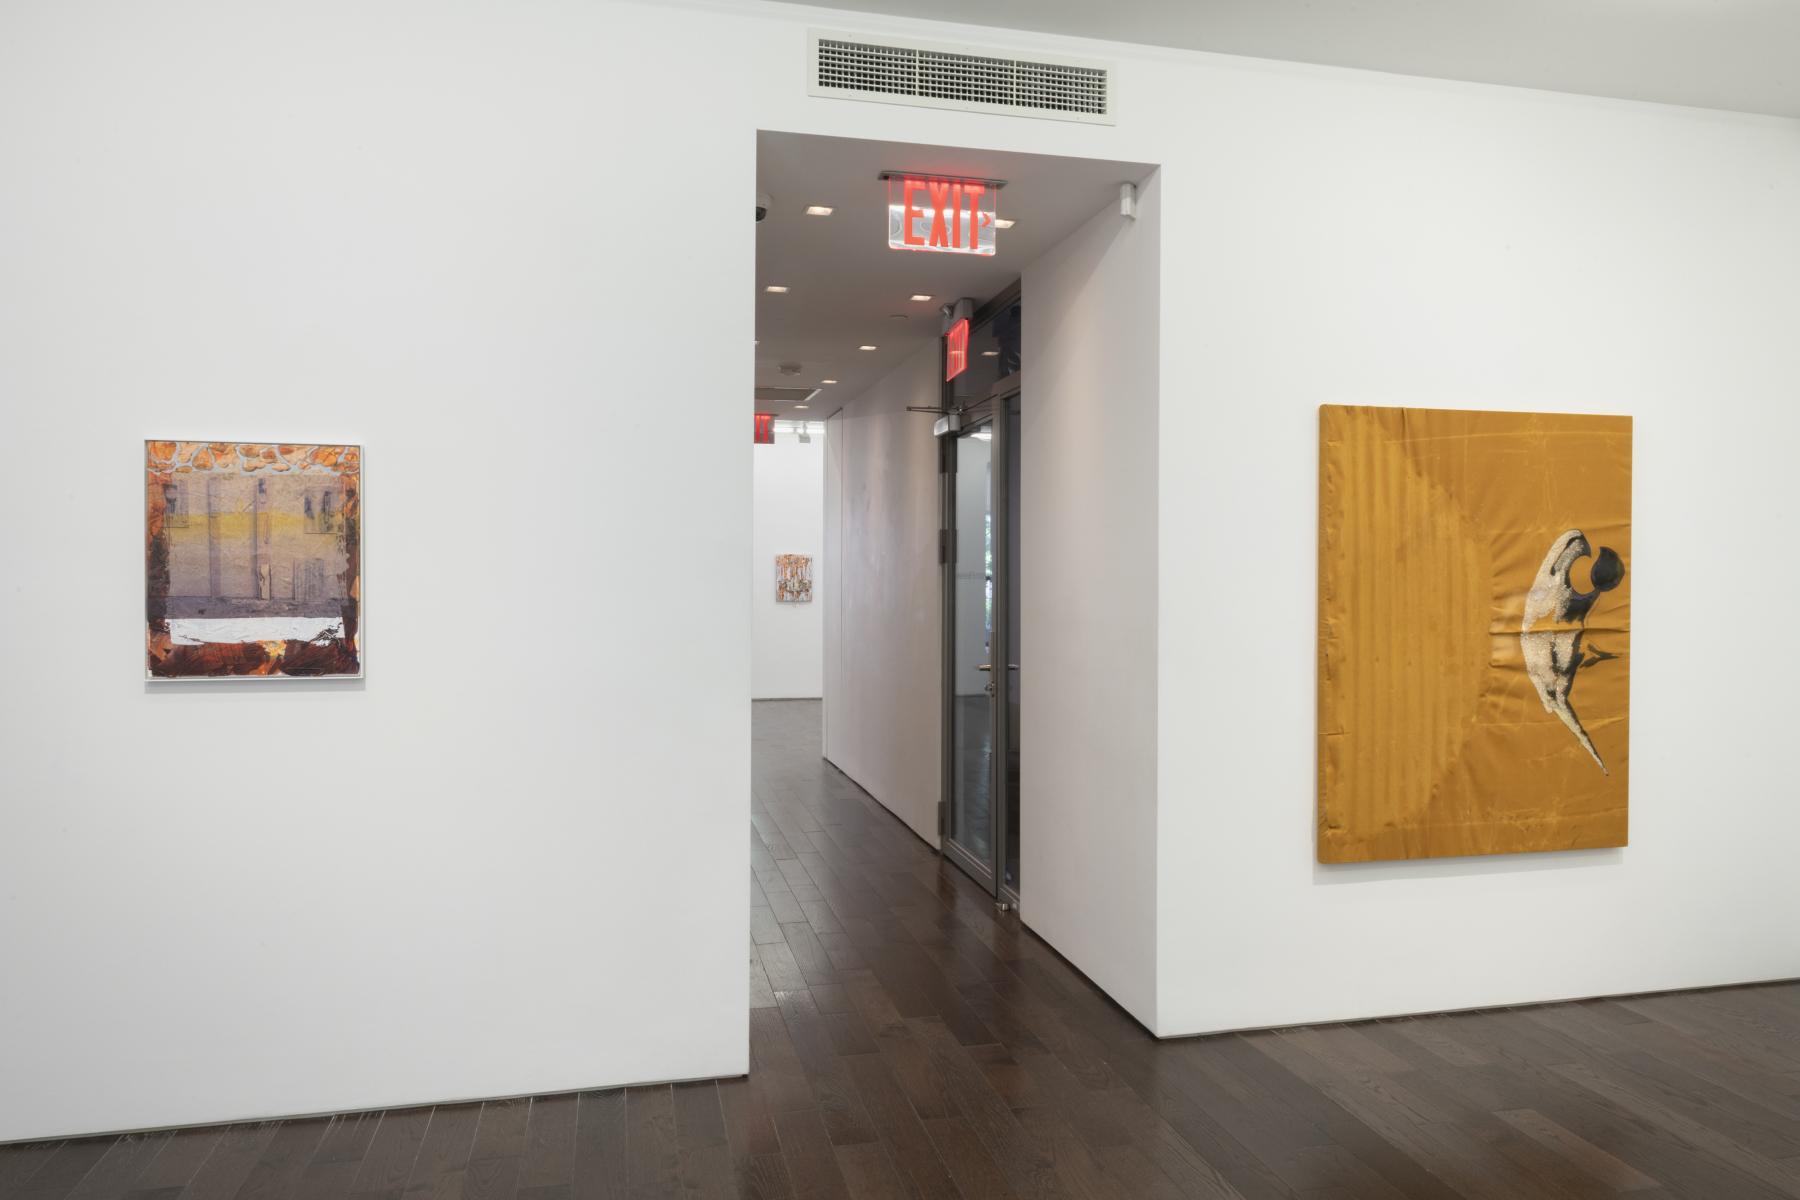 Exhibition View Wrecked Angle Ceysson & Bénétière New York 2021 (13)